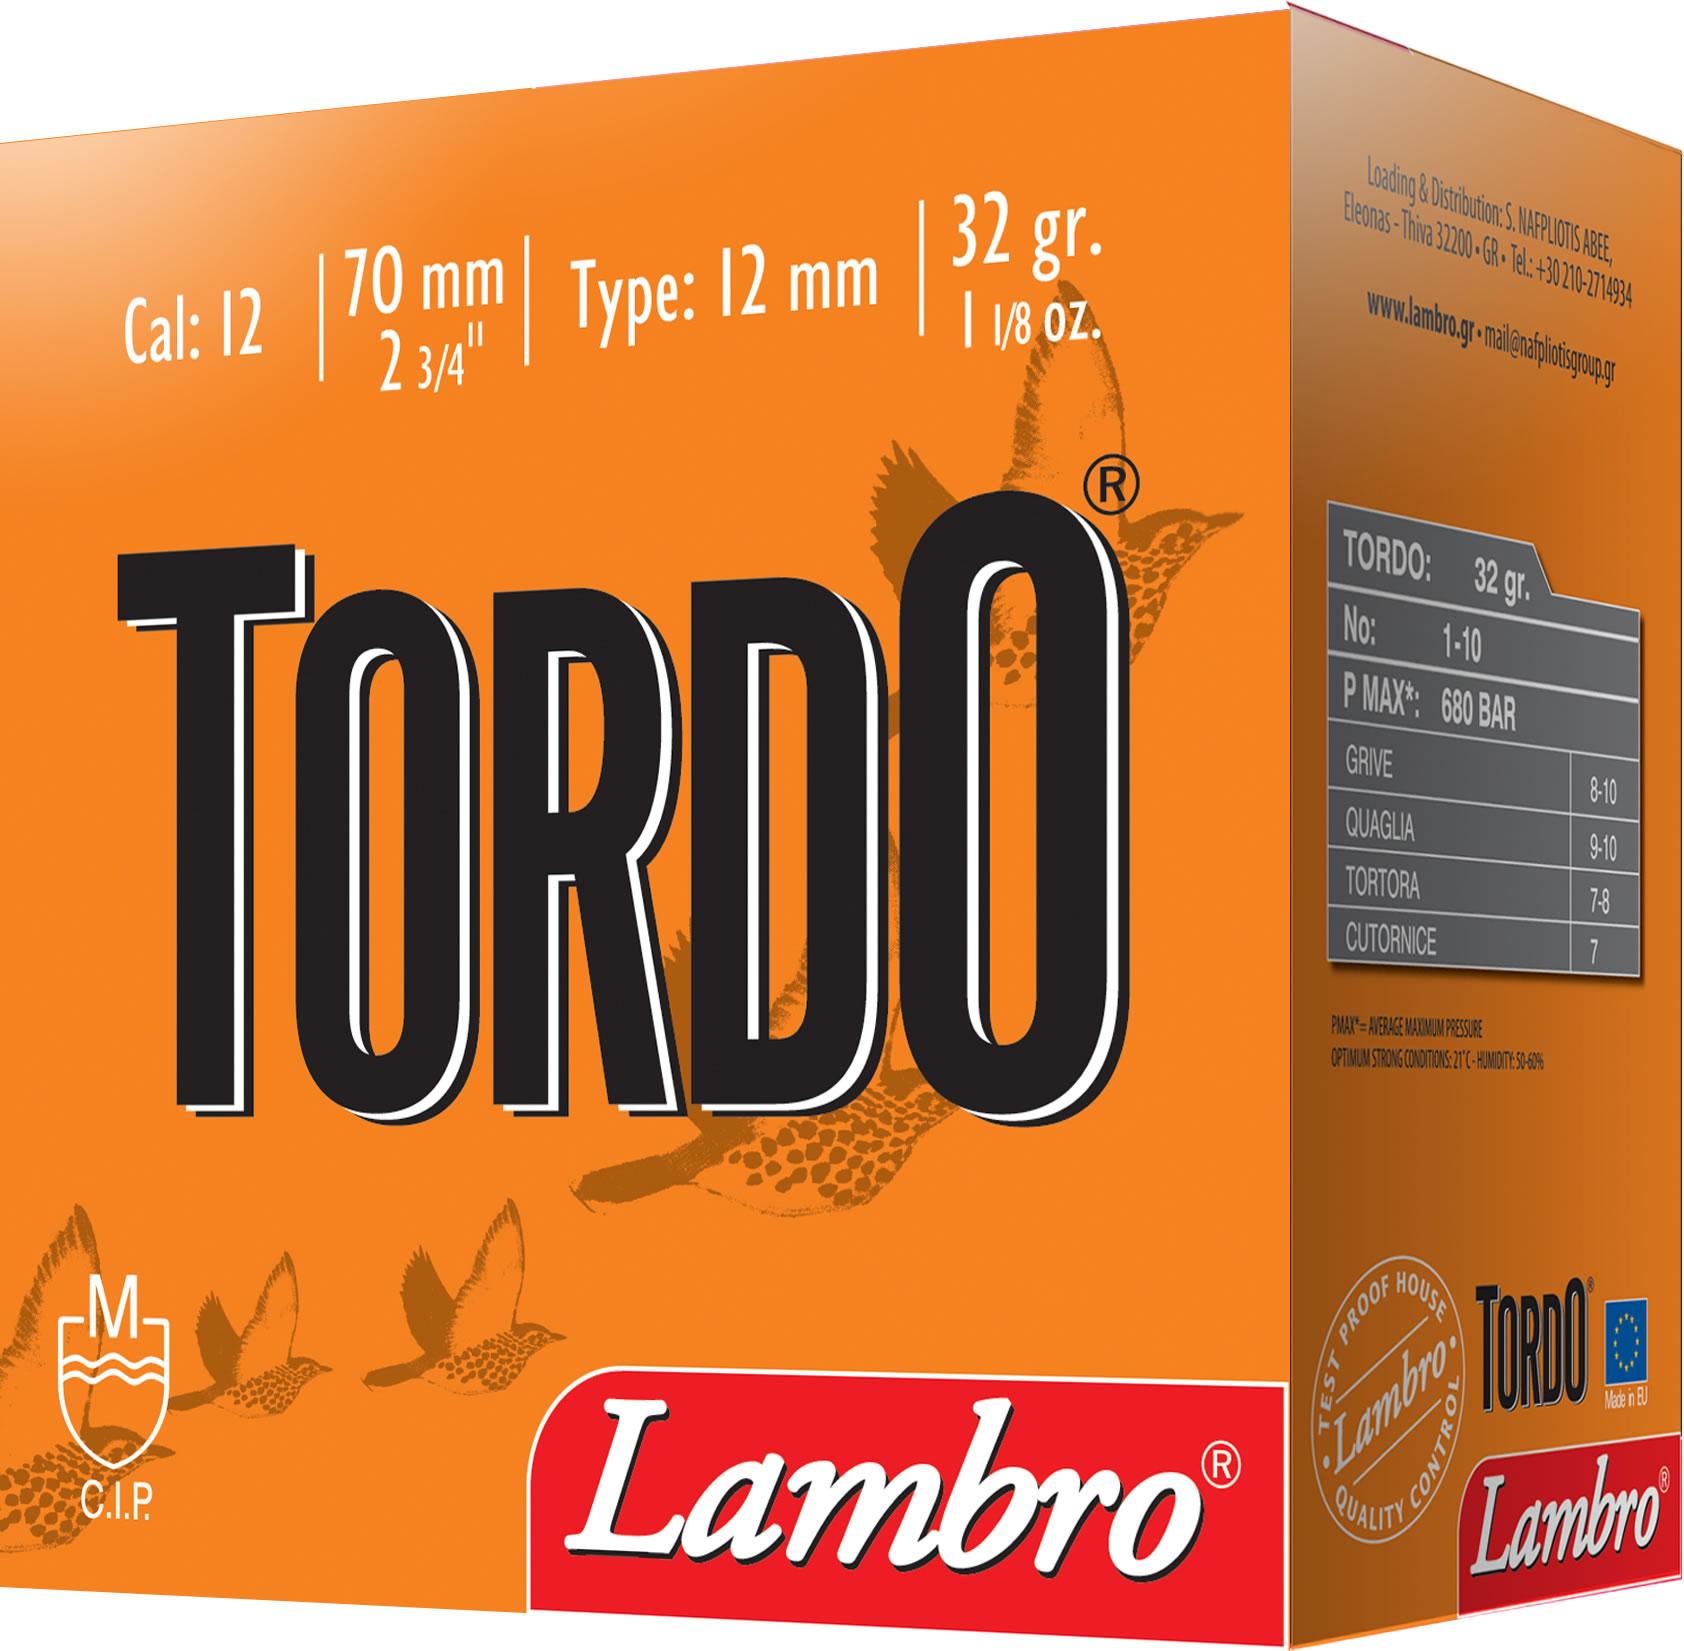 Lambro Tordo 12/70 32g